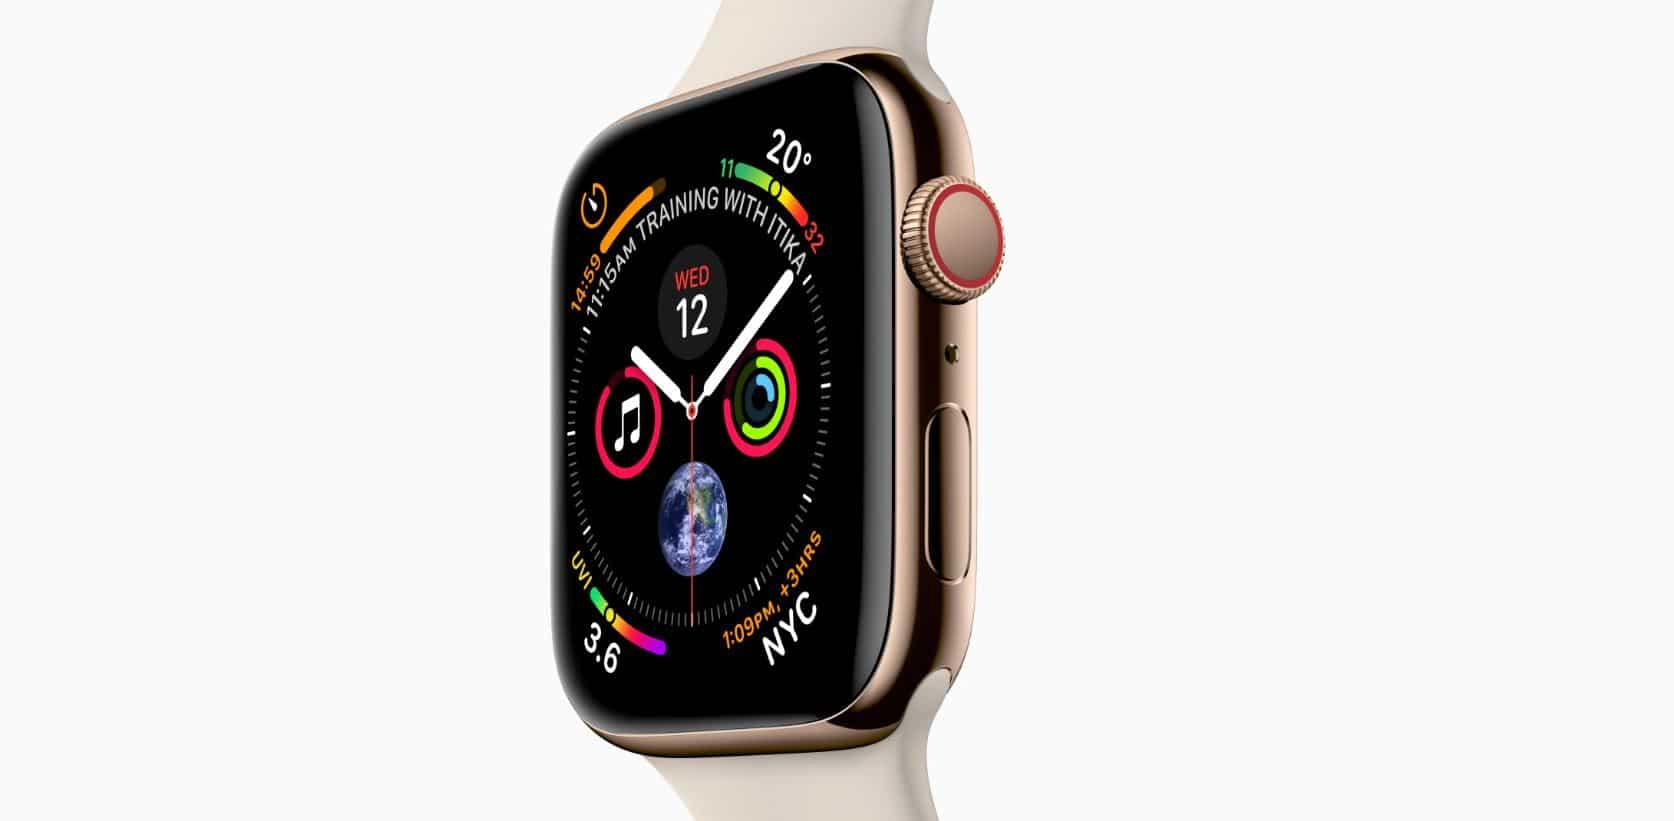 1. Apple Watch Series 4